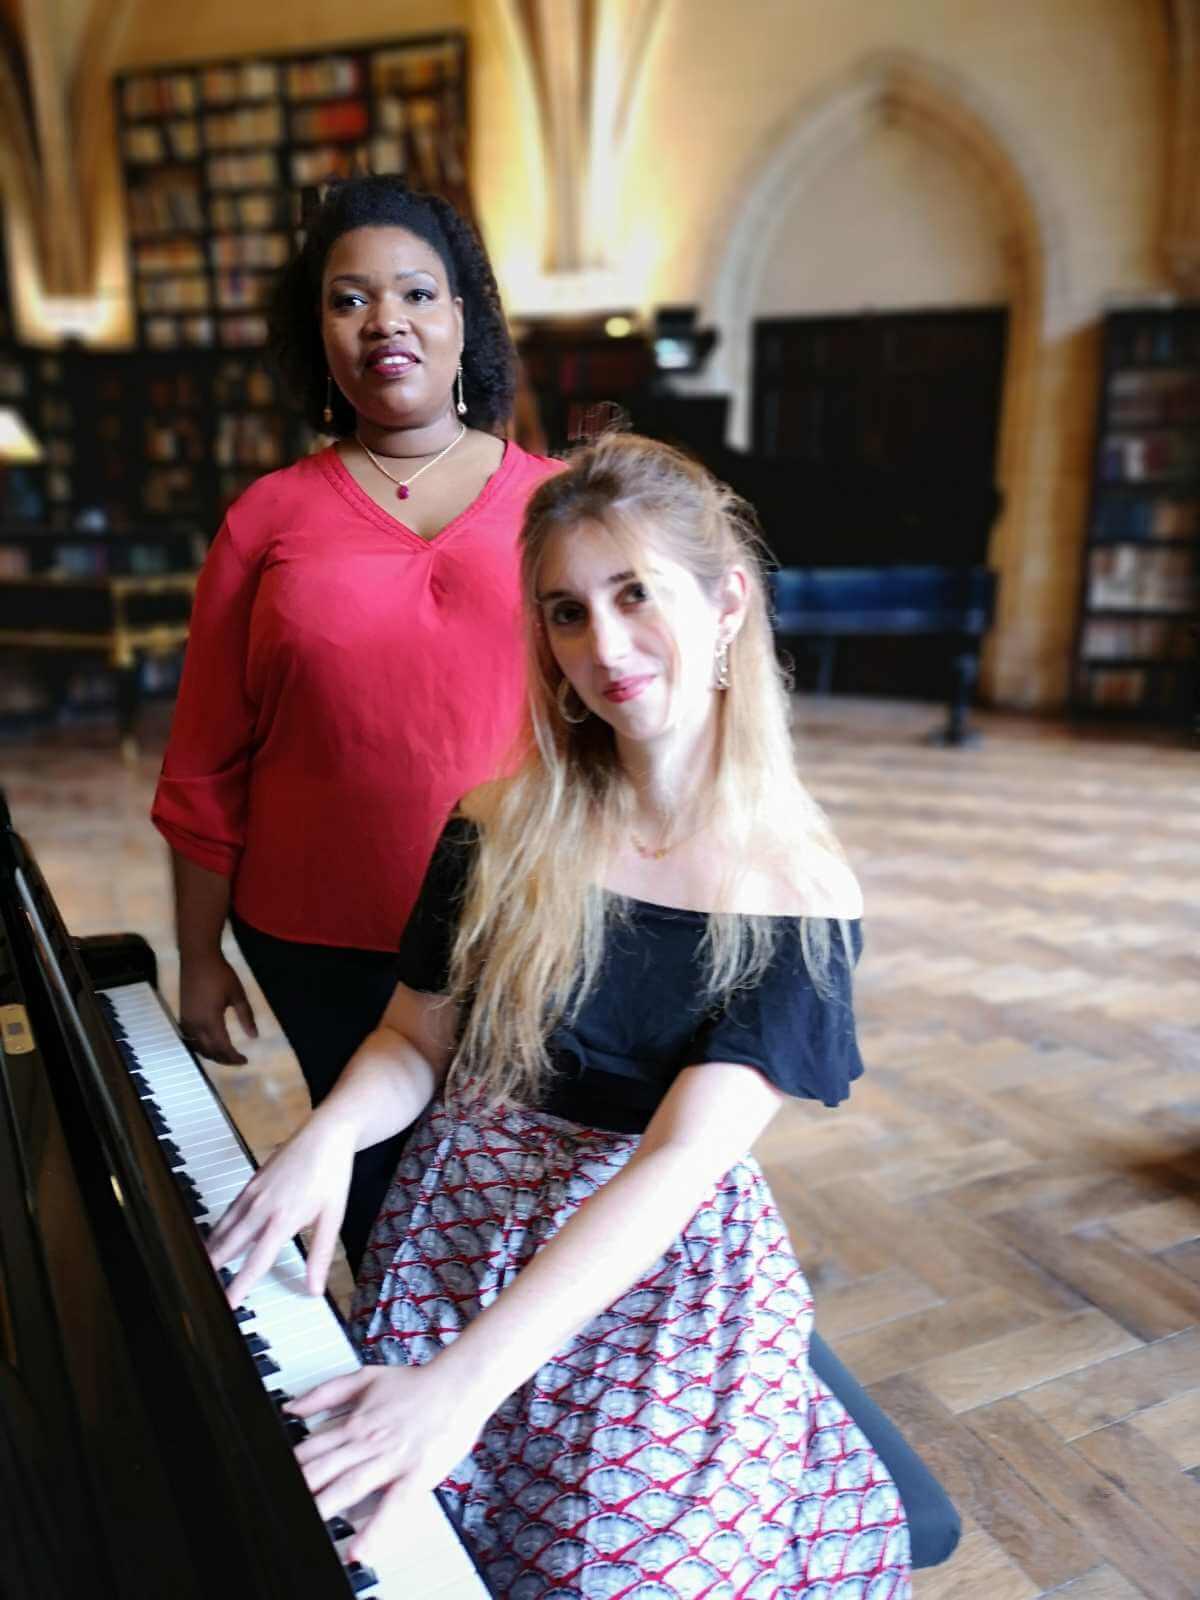 Marie-Laure Garnier et Celia Oneto Bensaid. (Photo: Aurelien Garcia)